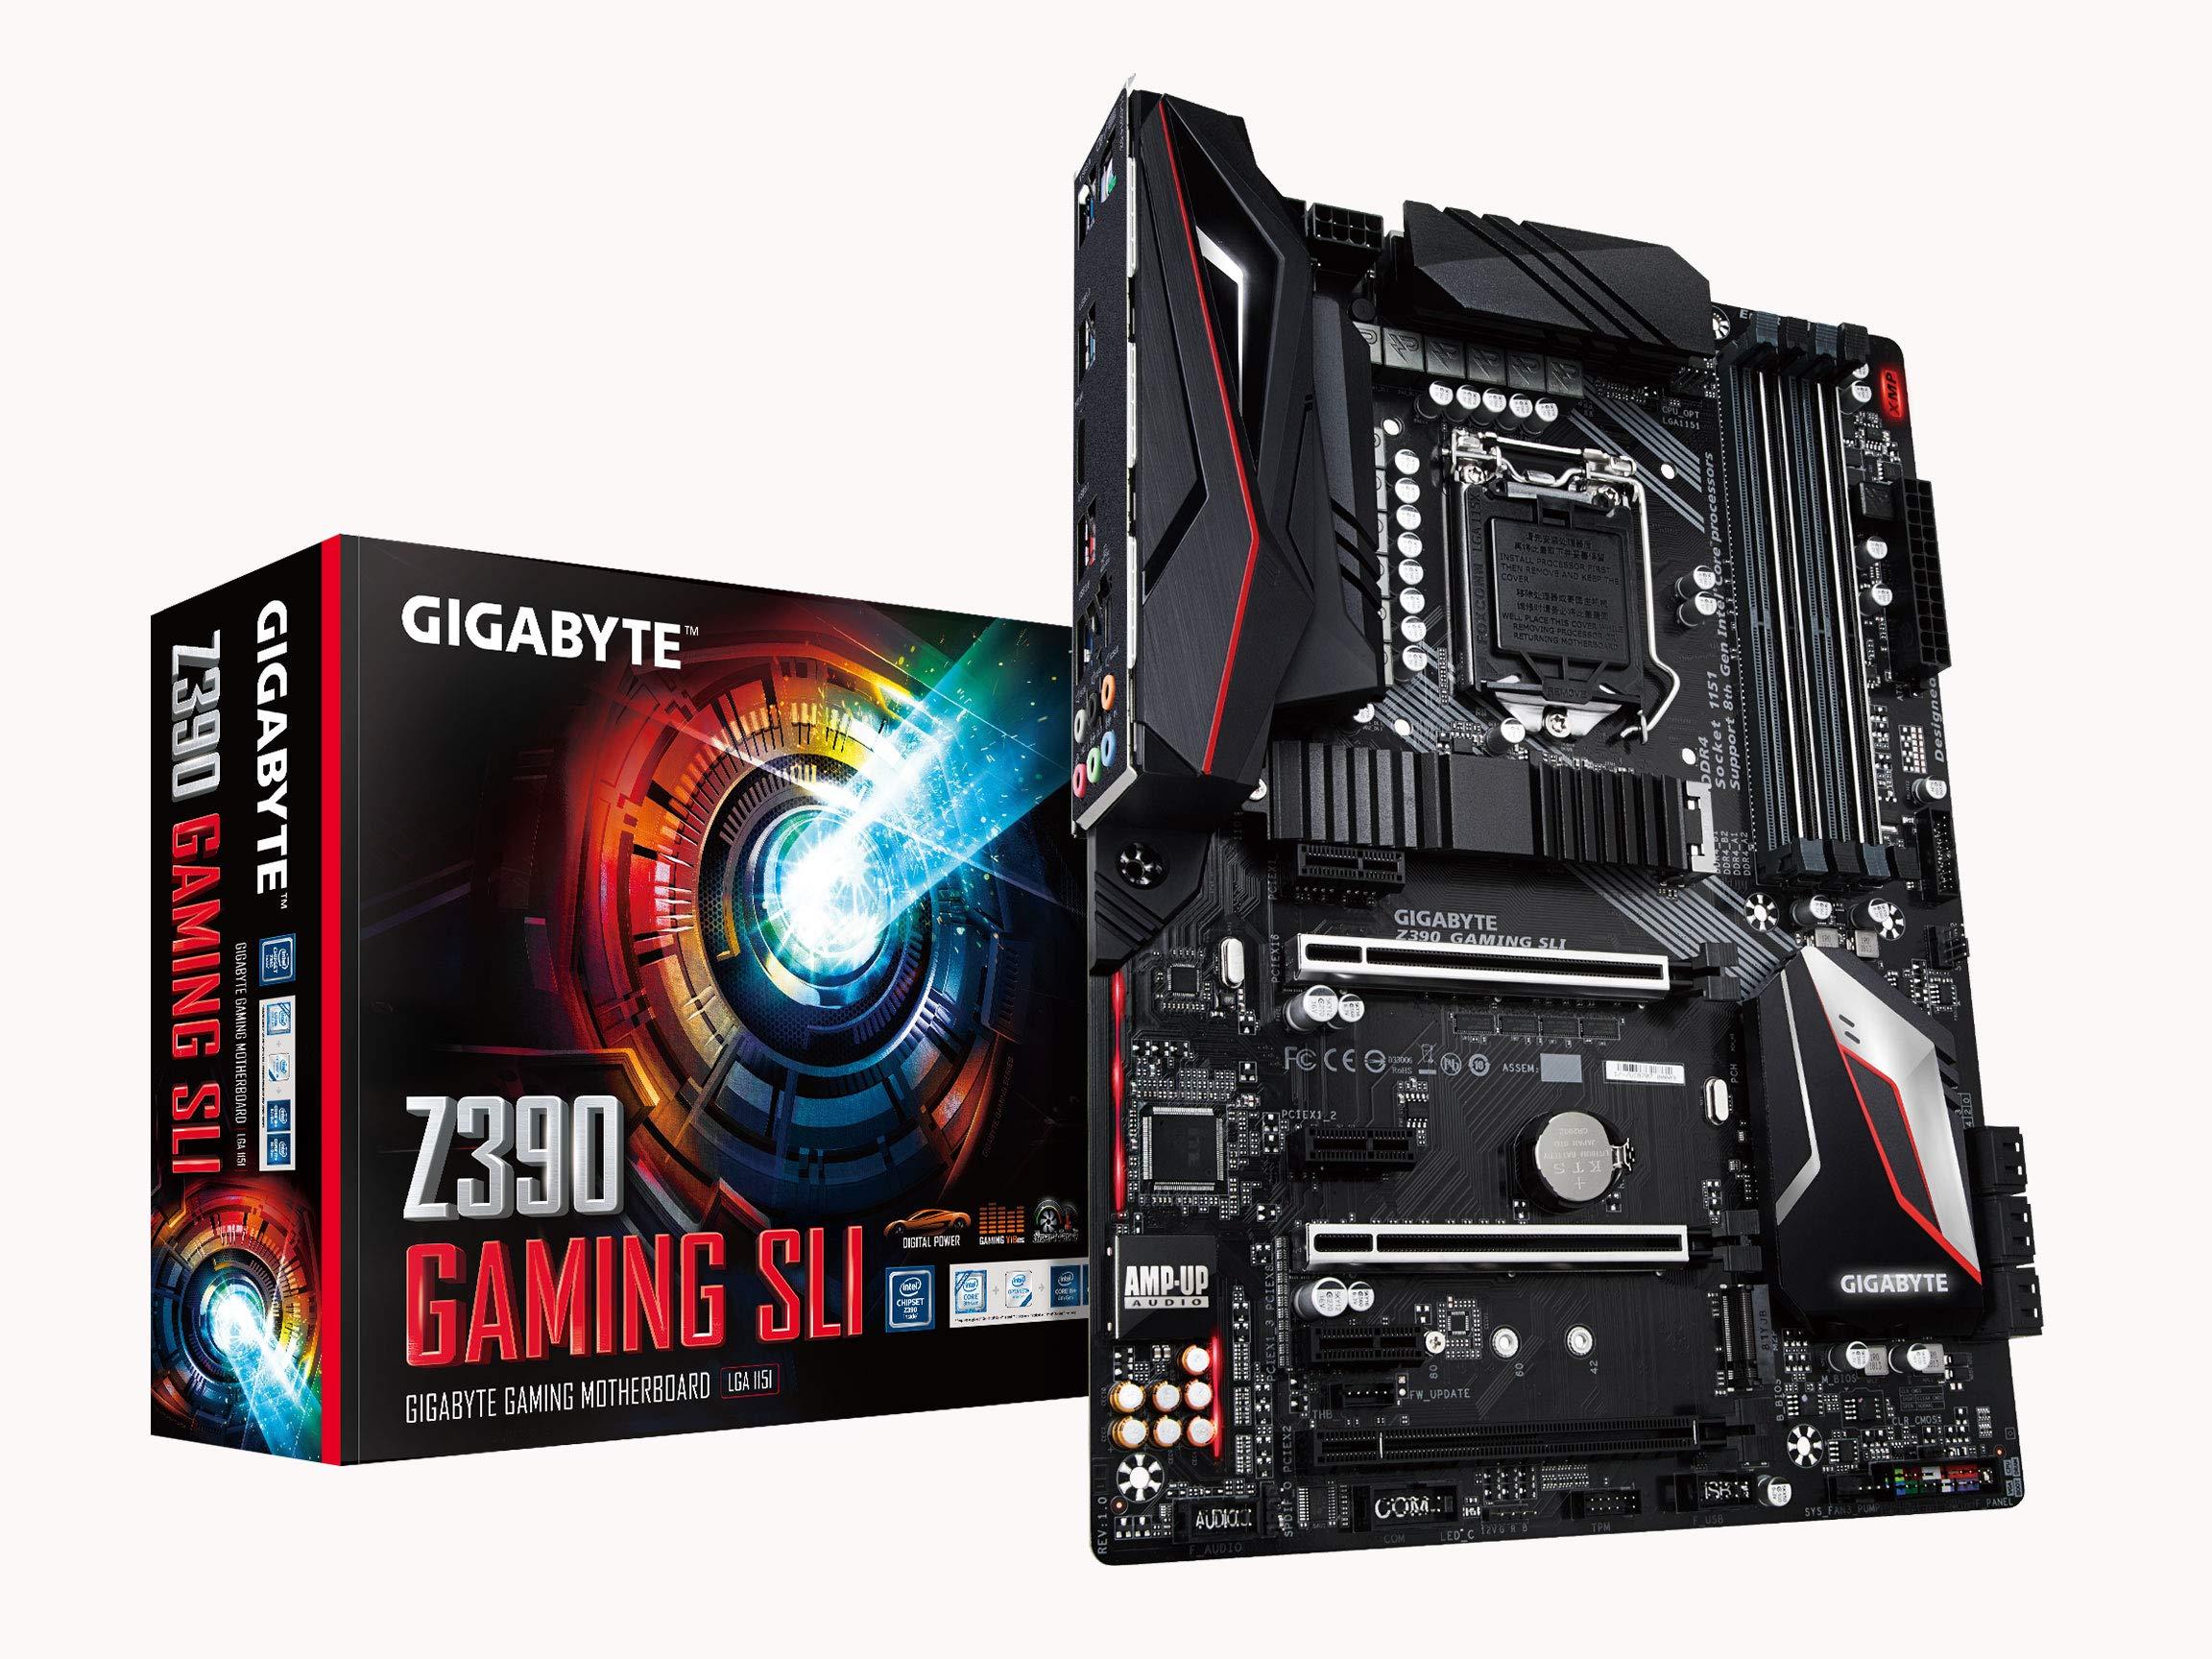 Intel DQ57TM Executive Series Q57 micro-ATX LGA1156 DDR3 1333MHz Desktop Motherboard